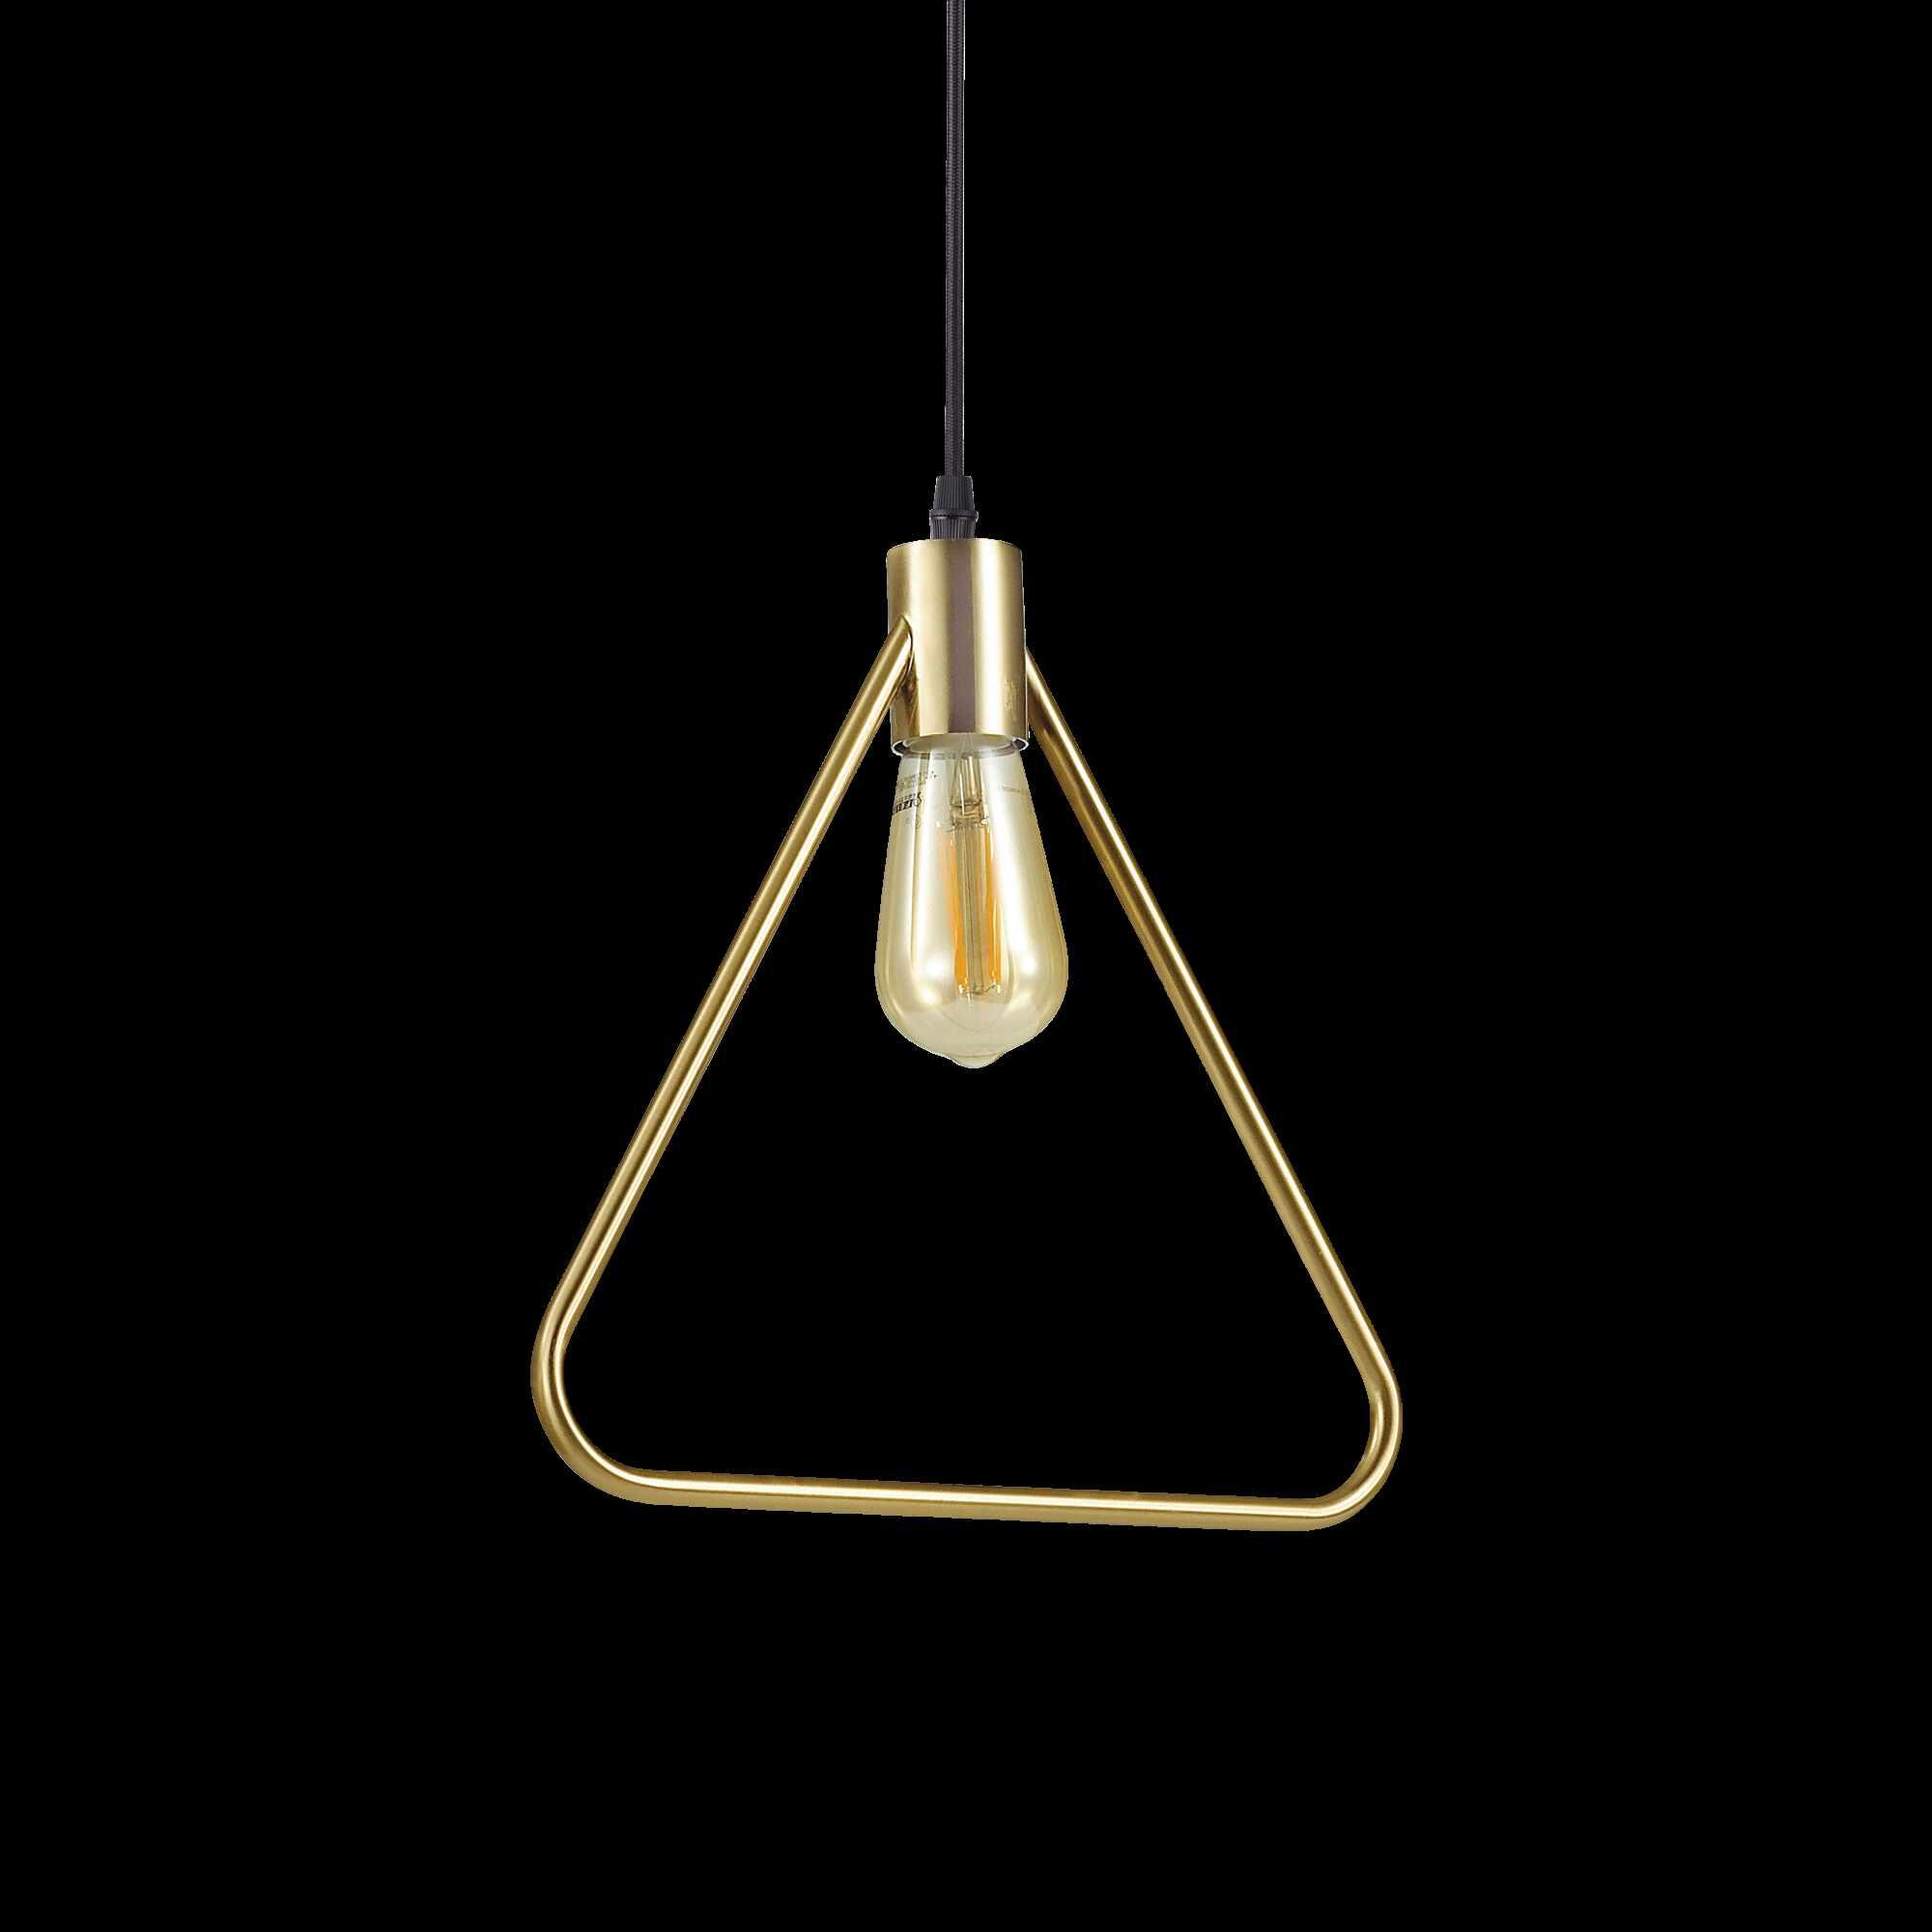 Lustra ABC SP1 Triangle Antique Brass la pret 389 lei